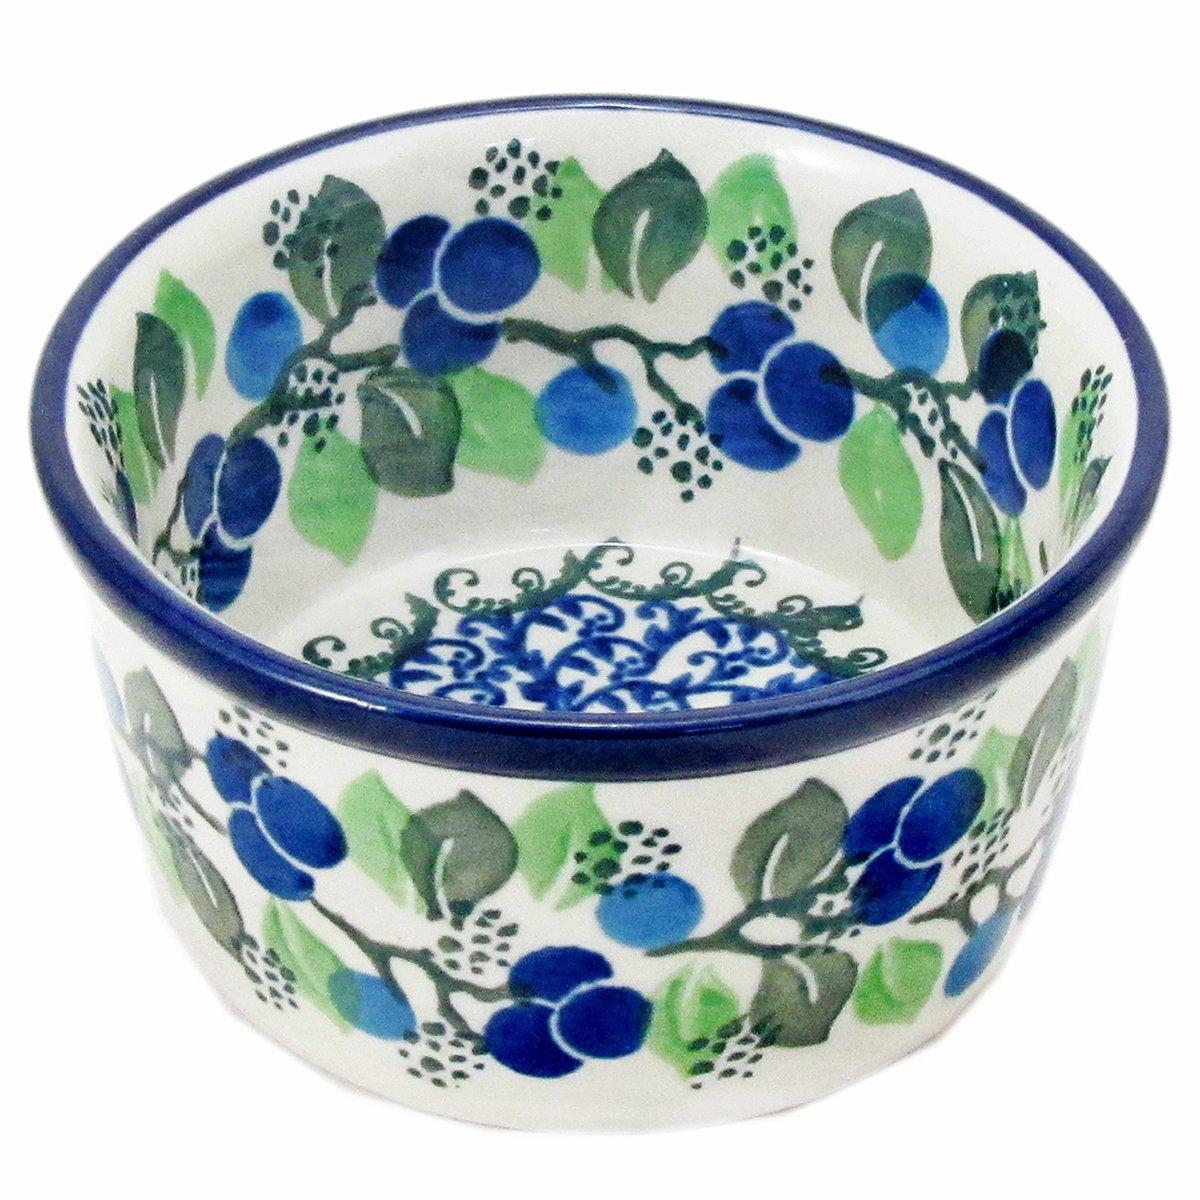 Polish Pottery 3.5'' Casual Handmade Ramekin 409- Blueberries by Polish Pottery Boleslawiec (Image #1)